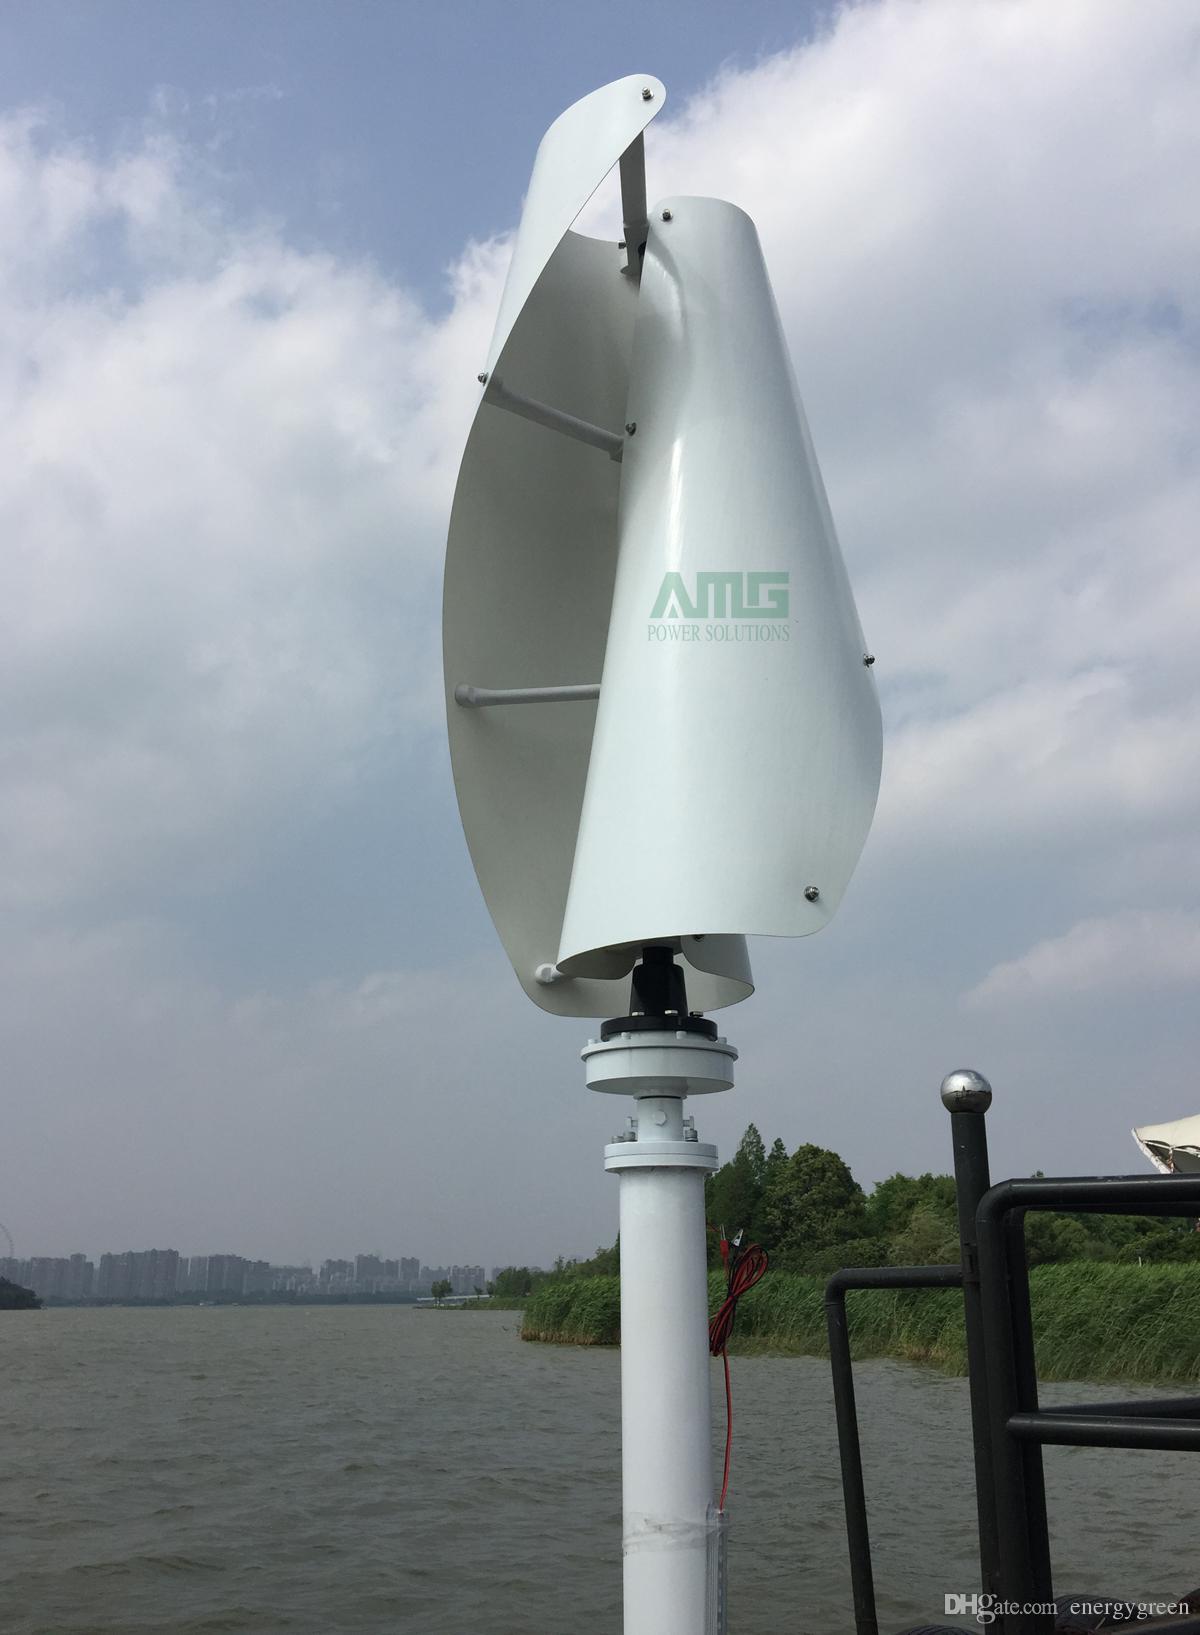 600W 12V / 24V Vertikalachse Helix Residentail Home Windturbinengenerator Kit Aerogenerator Generator mit niedriger Drehzahl 1,3 m / s Anlaufwind